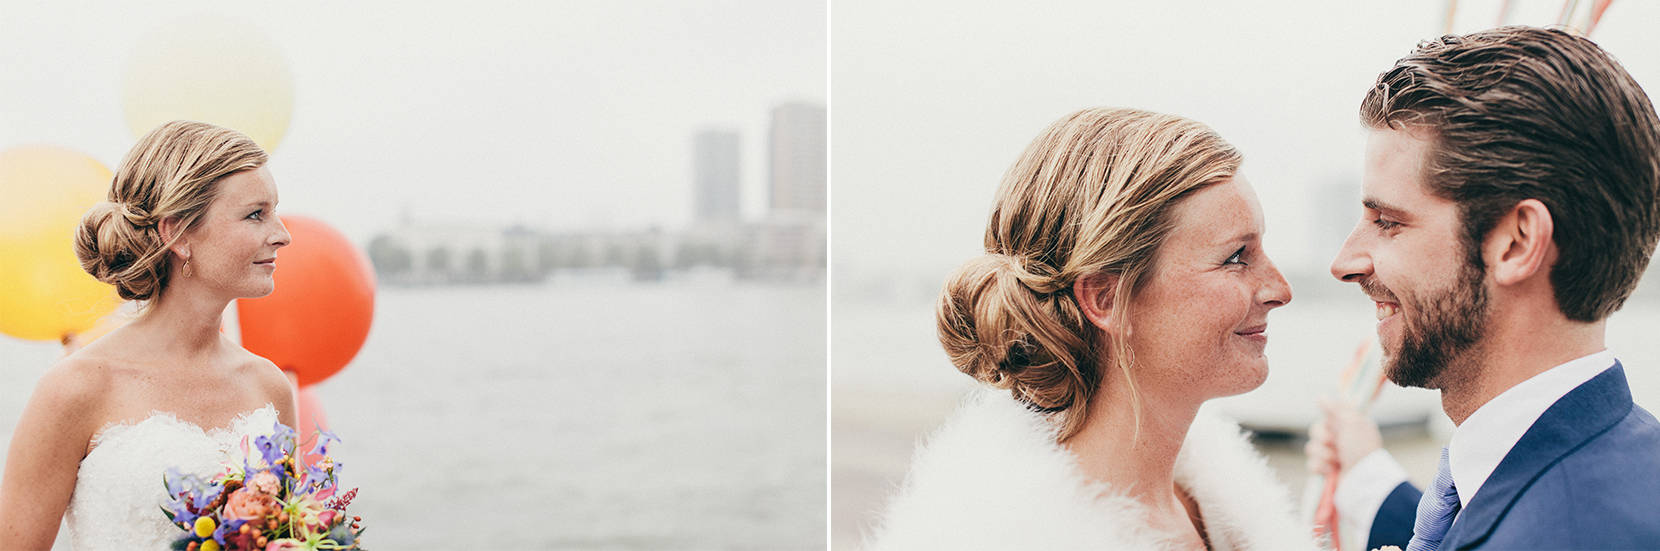 Bruidsfotografie_Rotterdam_Rogier_Martine-30